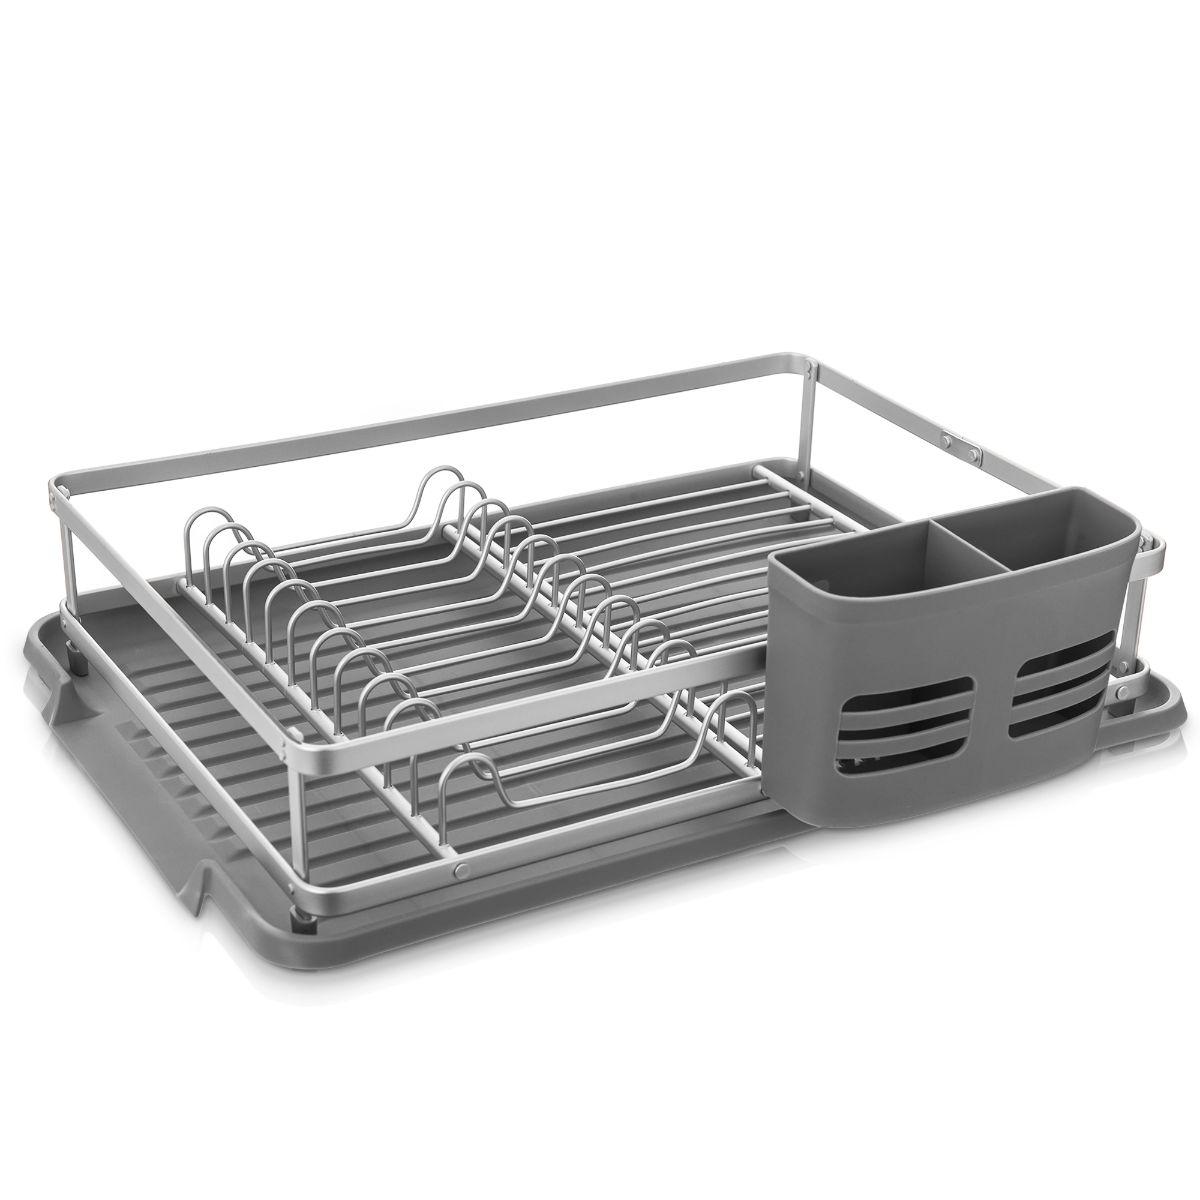 UK STOCK Dish Drainer Durable 4 Colors Plastic Drip Tray Drain Board Pro Top